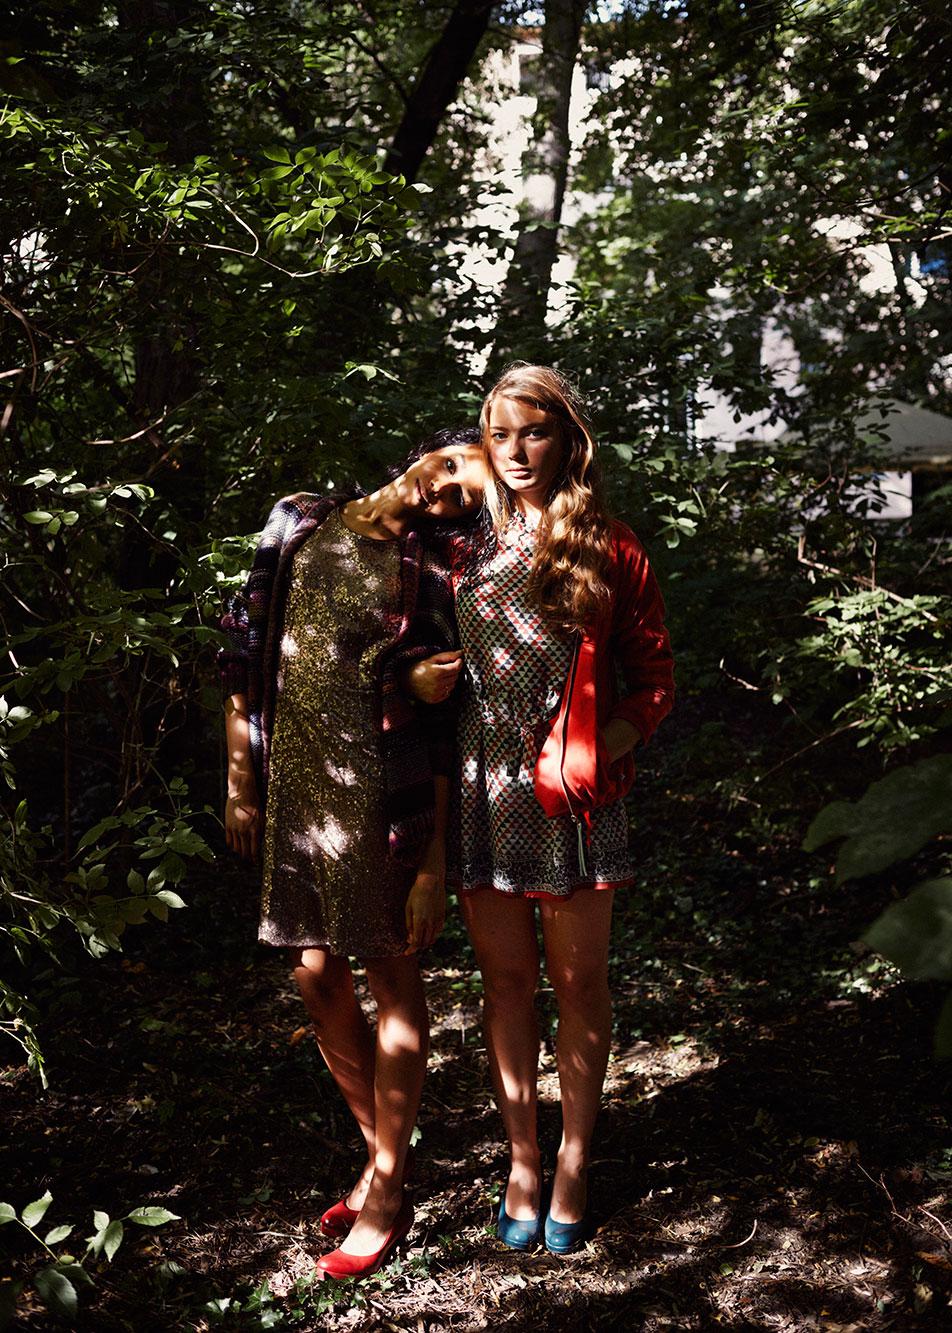 Marie & Daisy, 2013 Fashion Patrick Desbrosses